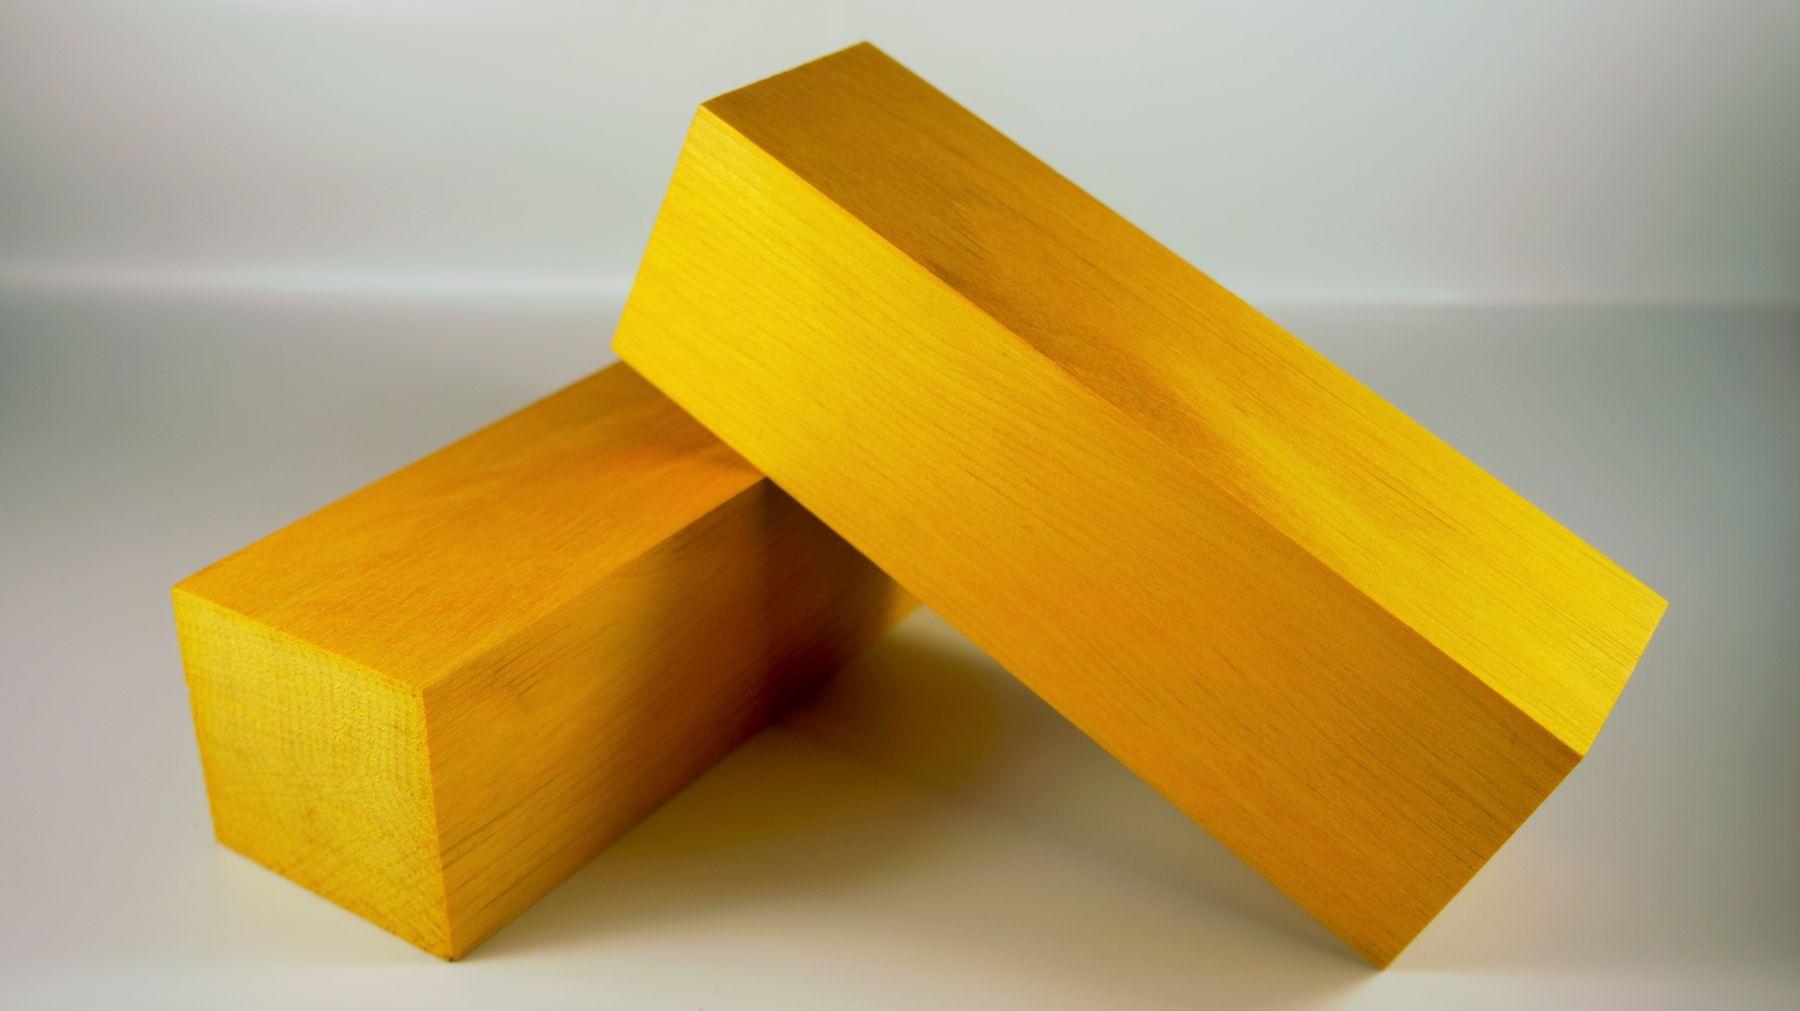 Желтый граб плашки 5-7-10 мм на выбор (цена за 1 шт)